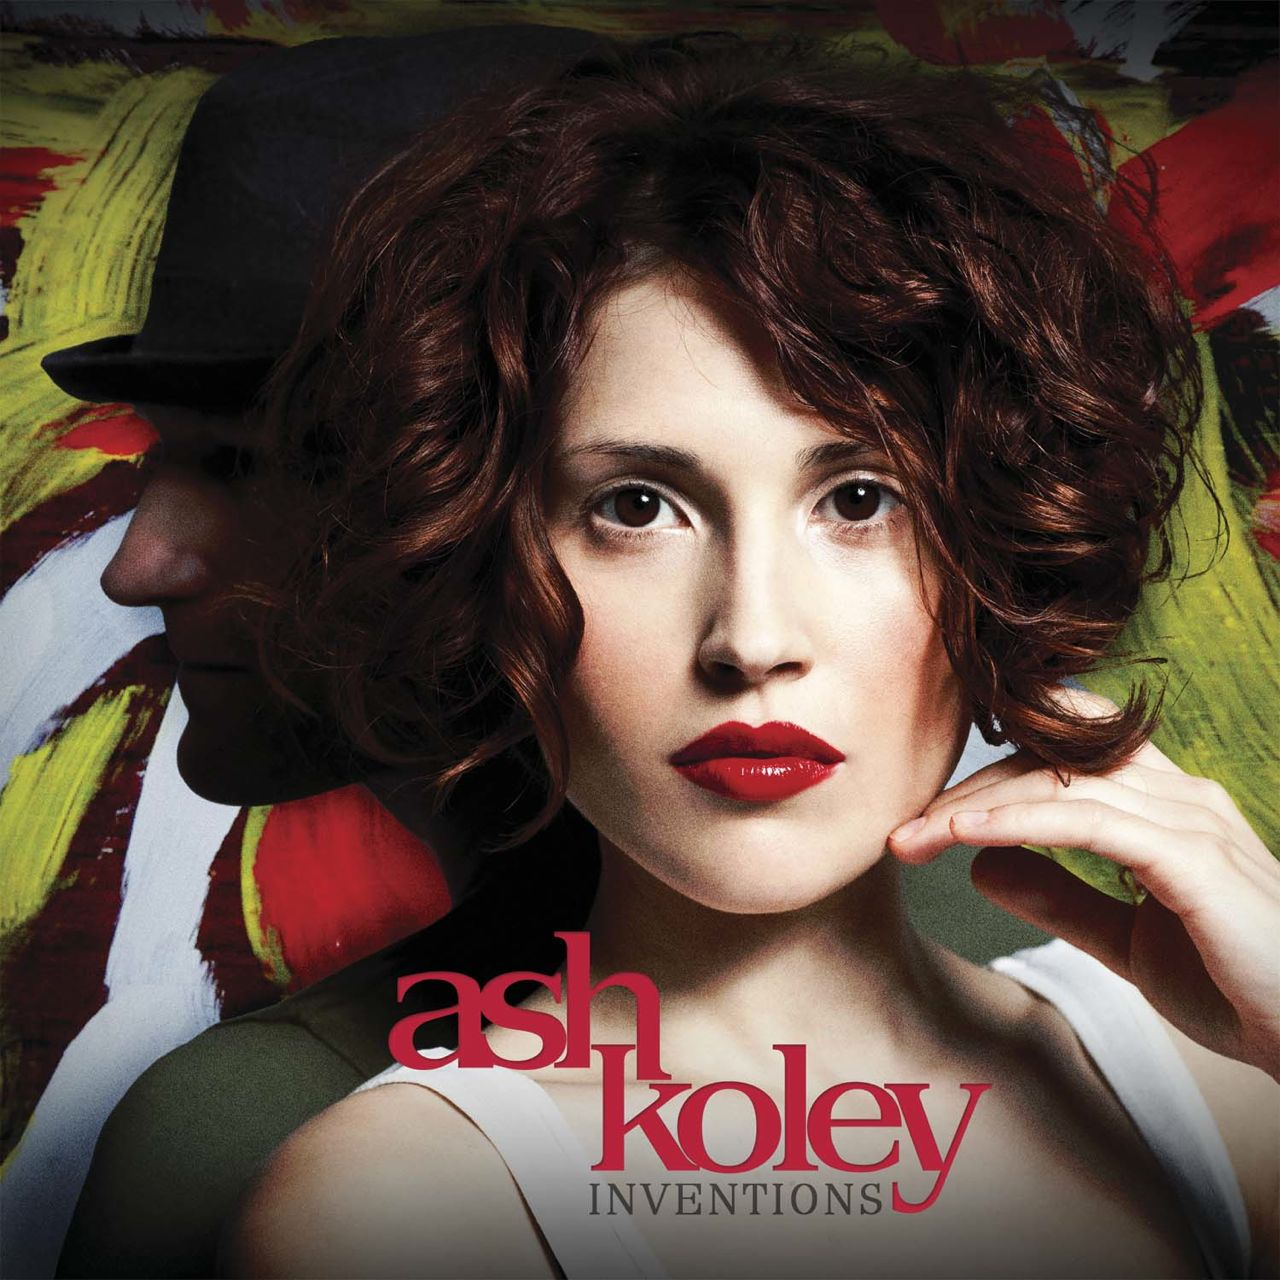 [10's] Ash Koley - Colliding (2010) Ash%20Koley%20-%20Inventions